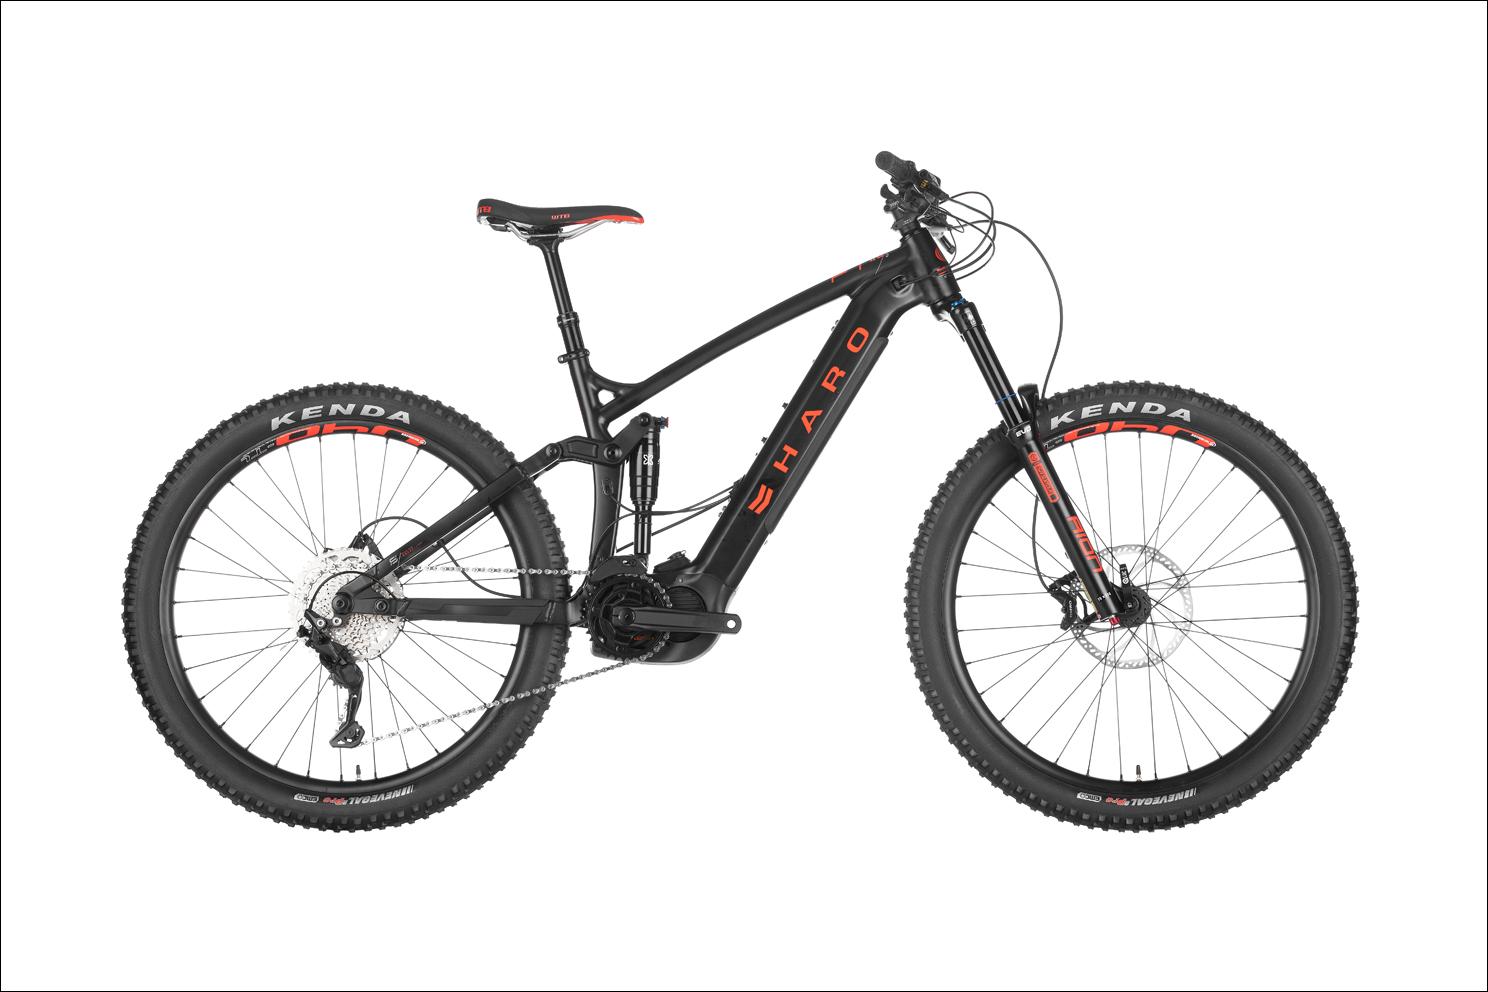 HARO SHIFT I/O 5 Electric Mountain Bike